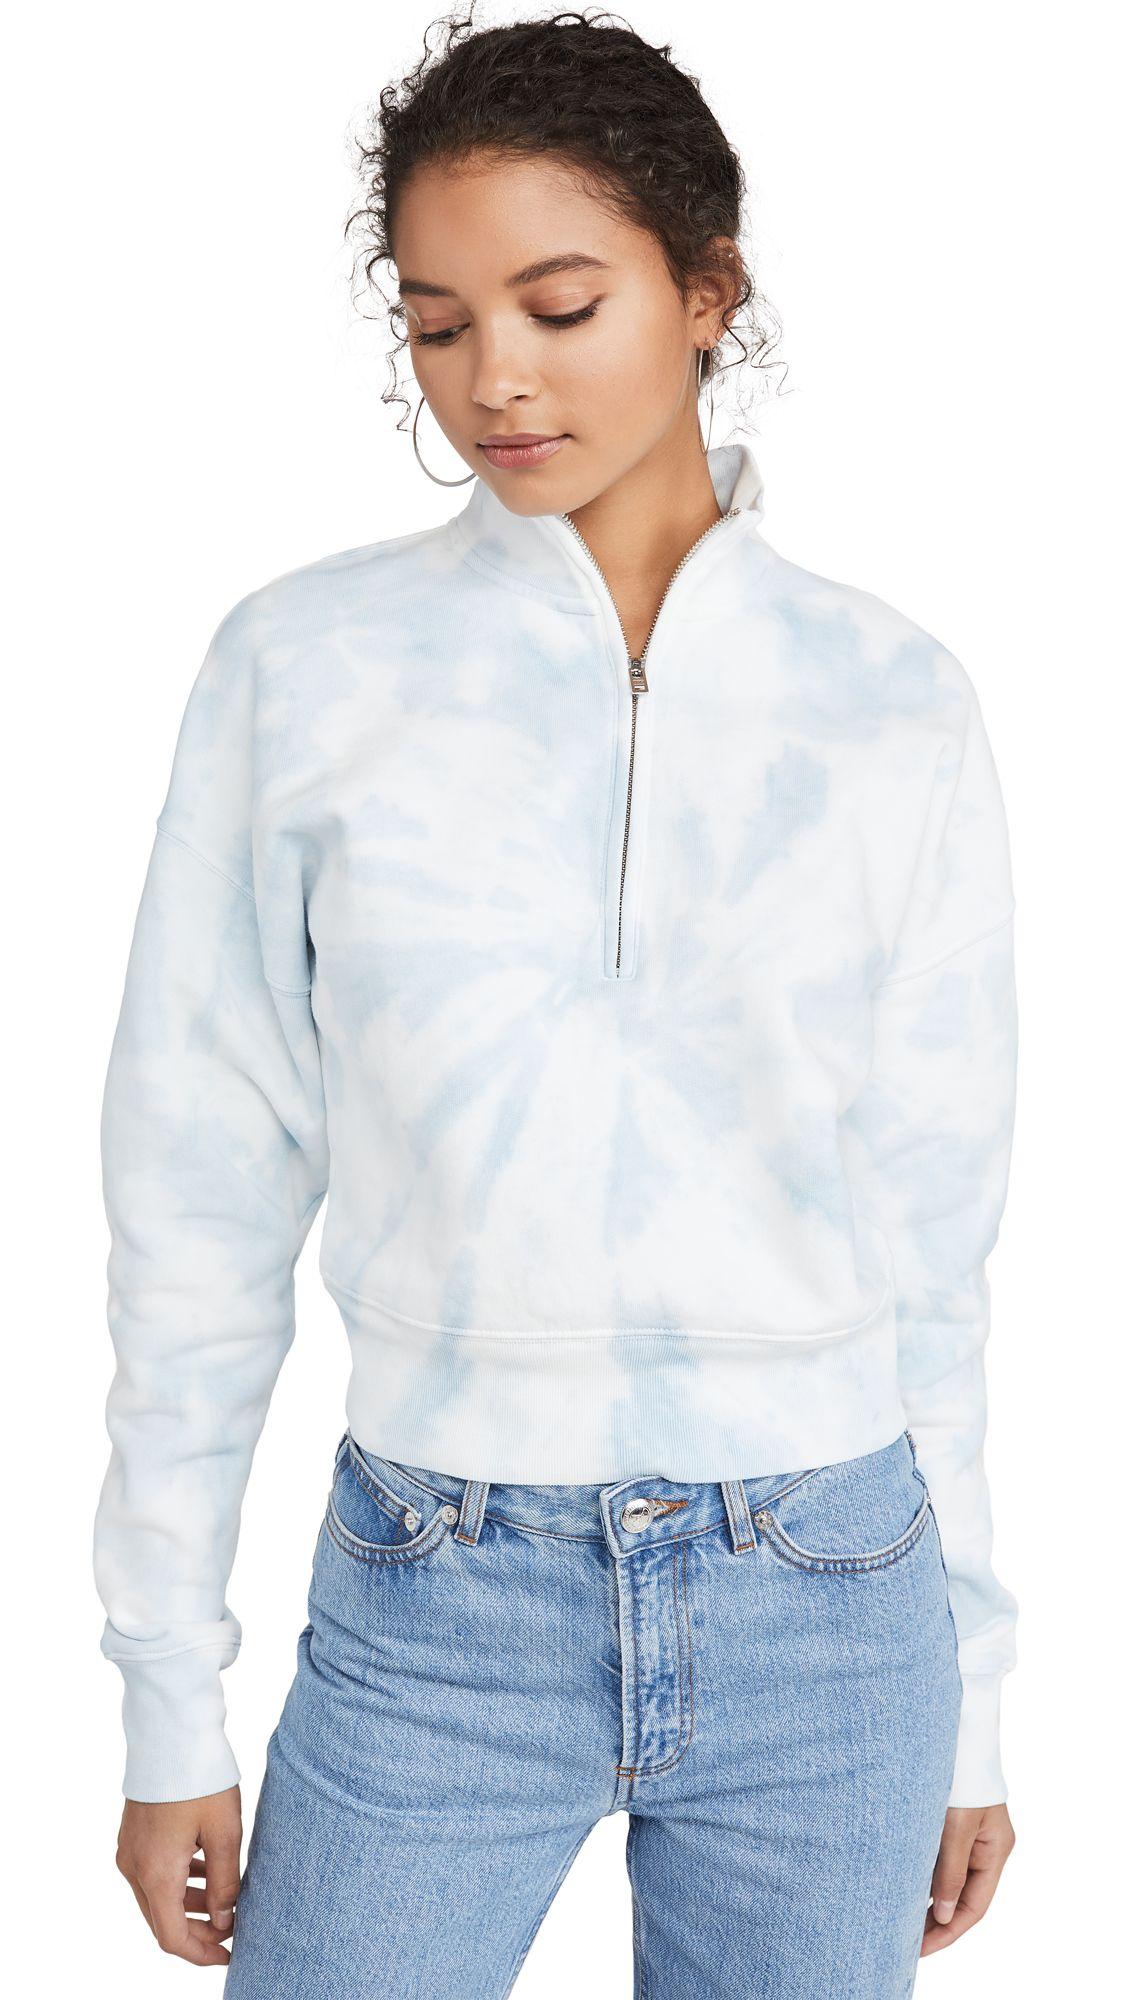 Reformation Marla Zip Sweatshirt Reformation Cloth [ 2000 x 1128 Pixel ]